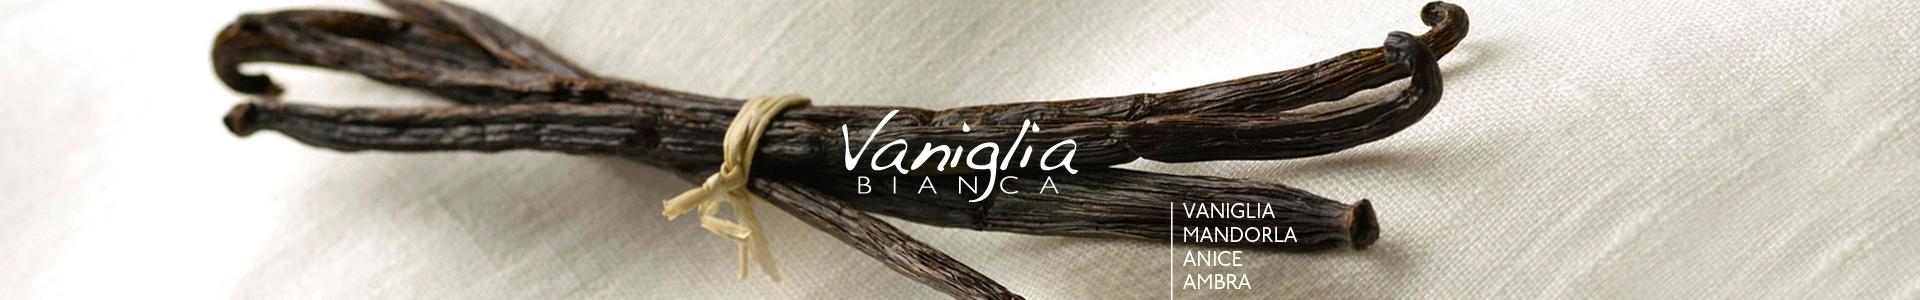 Vaniglia Bianca